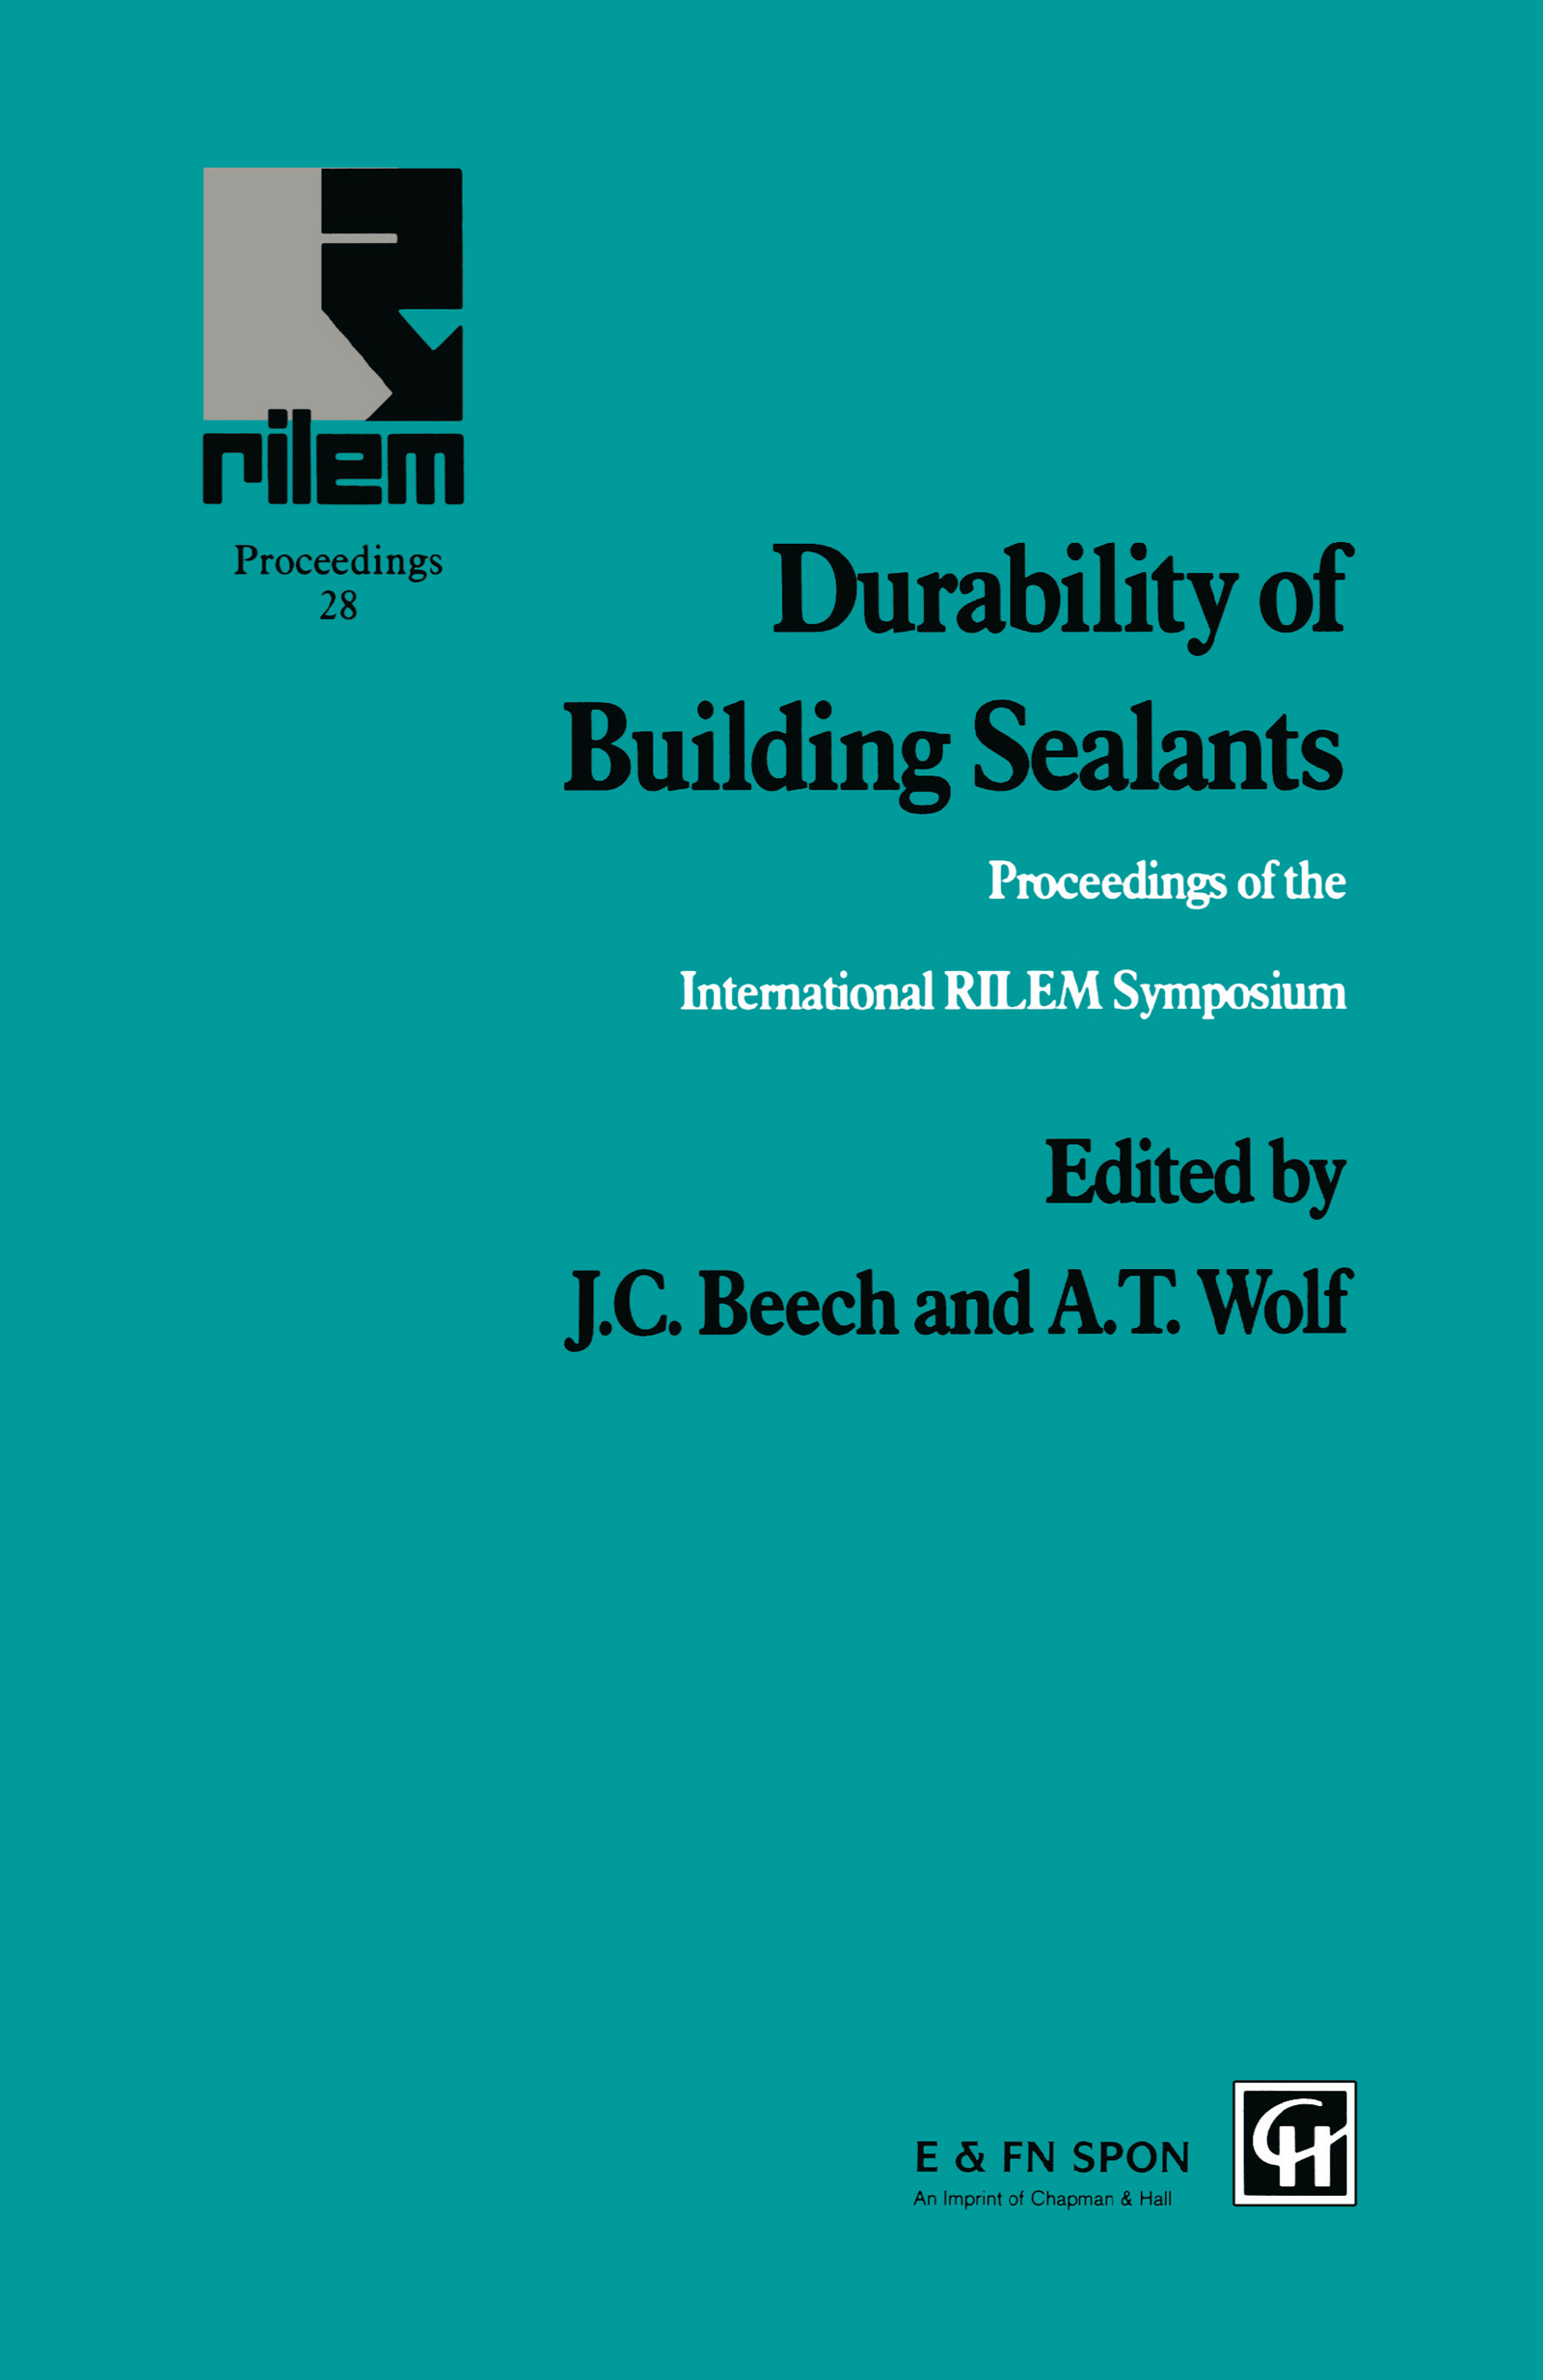 Durability of Building Sealants